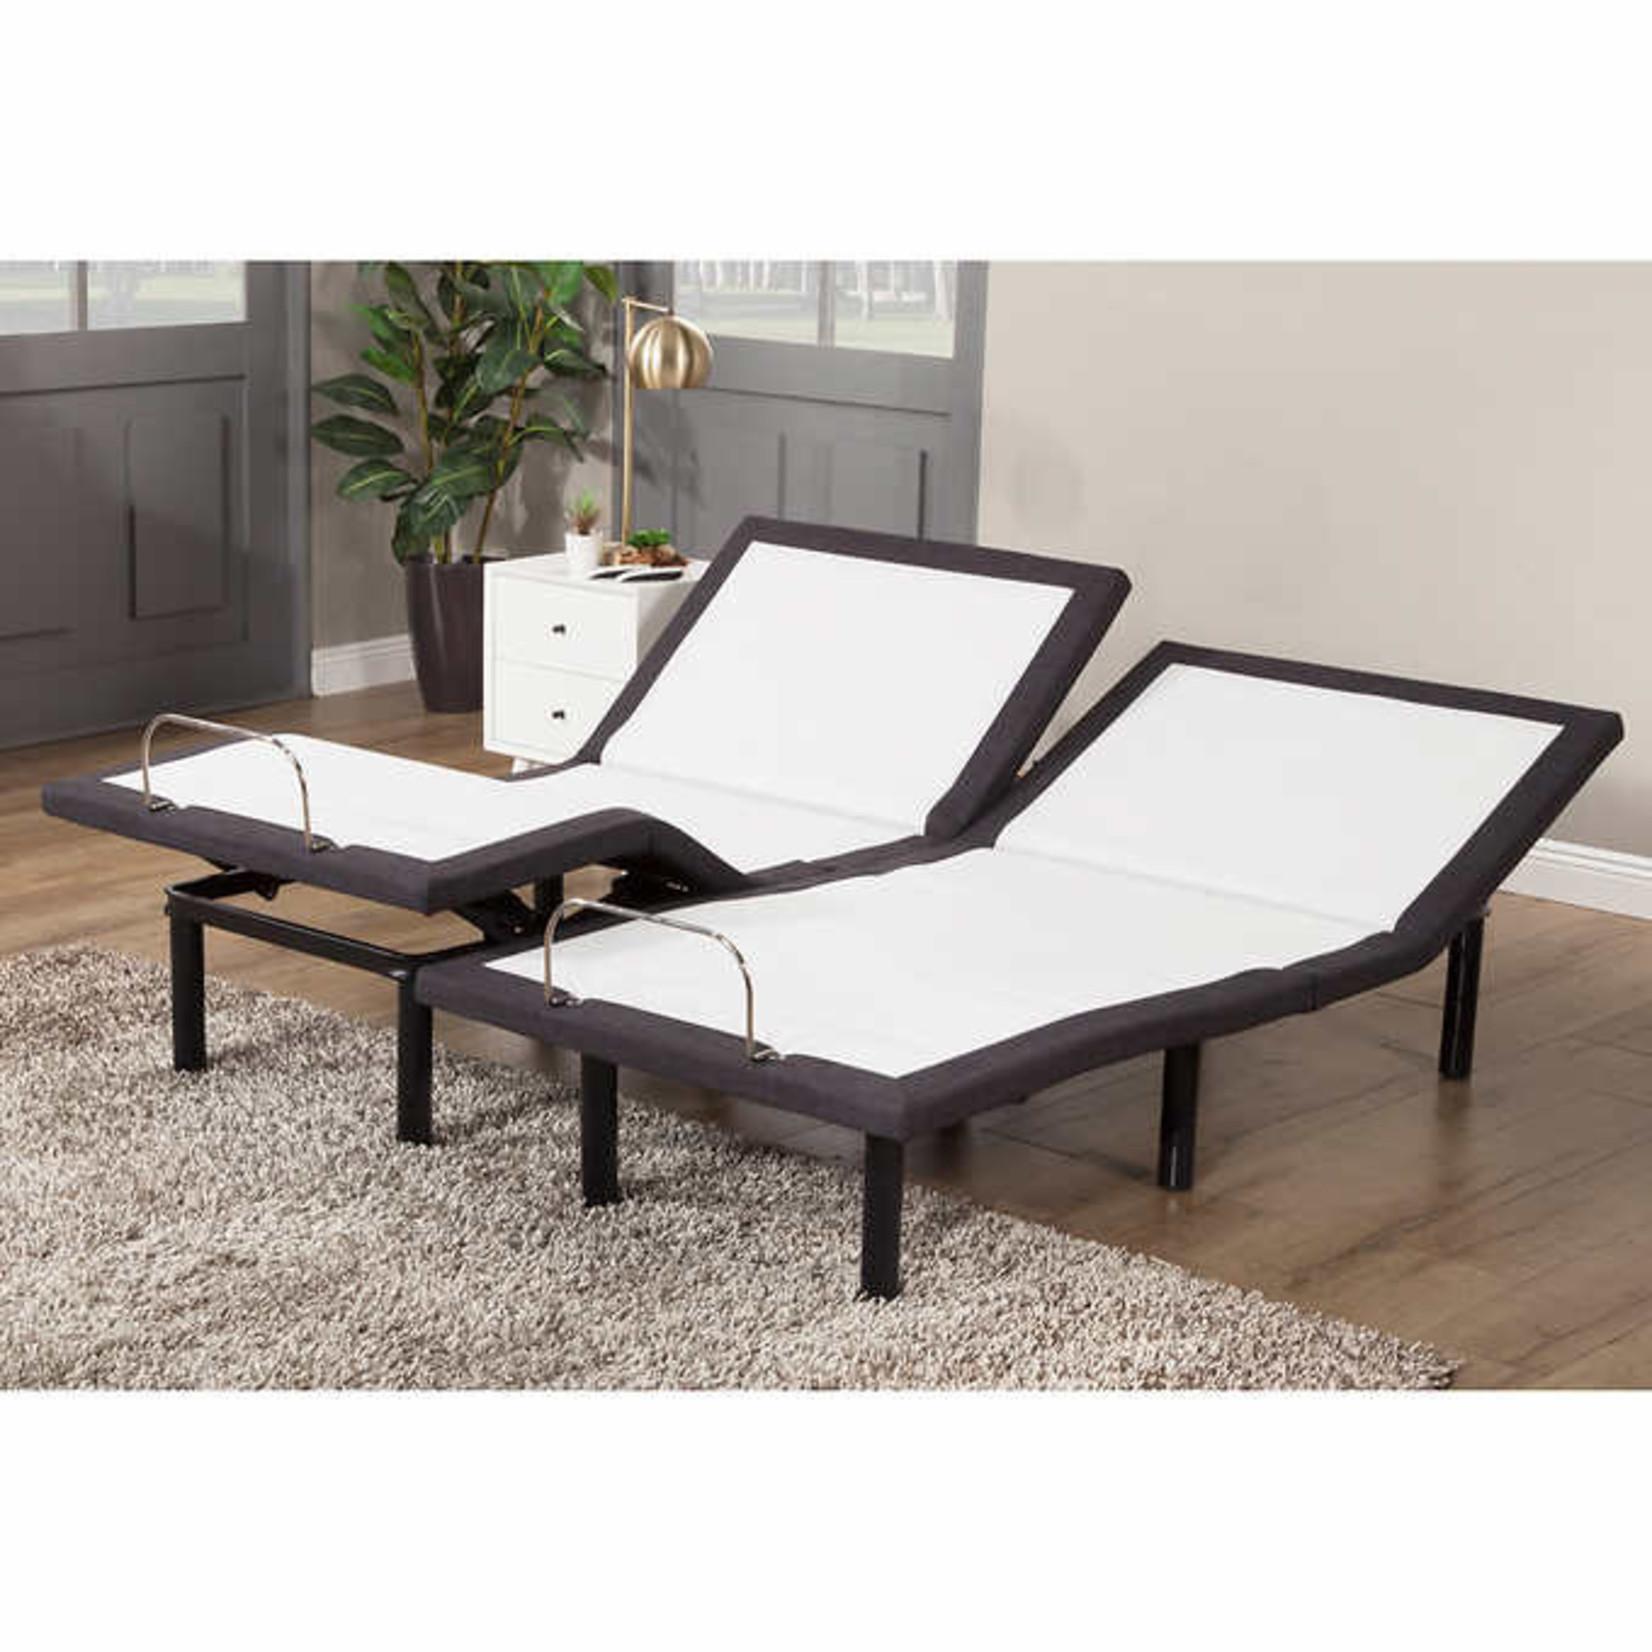 Sleep Science Q-Series King Adjustable Bed Base